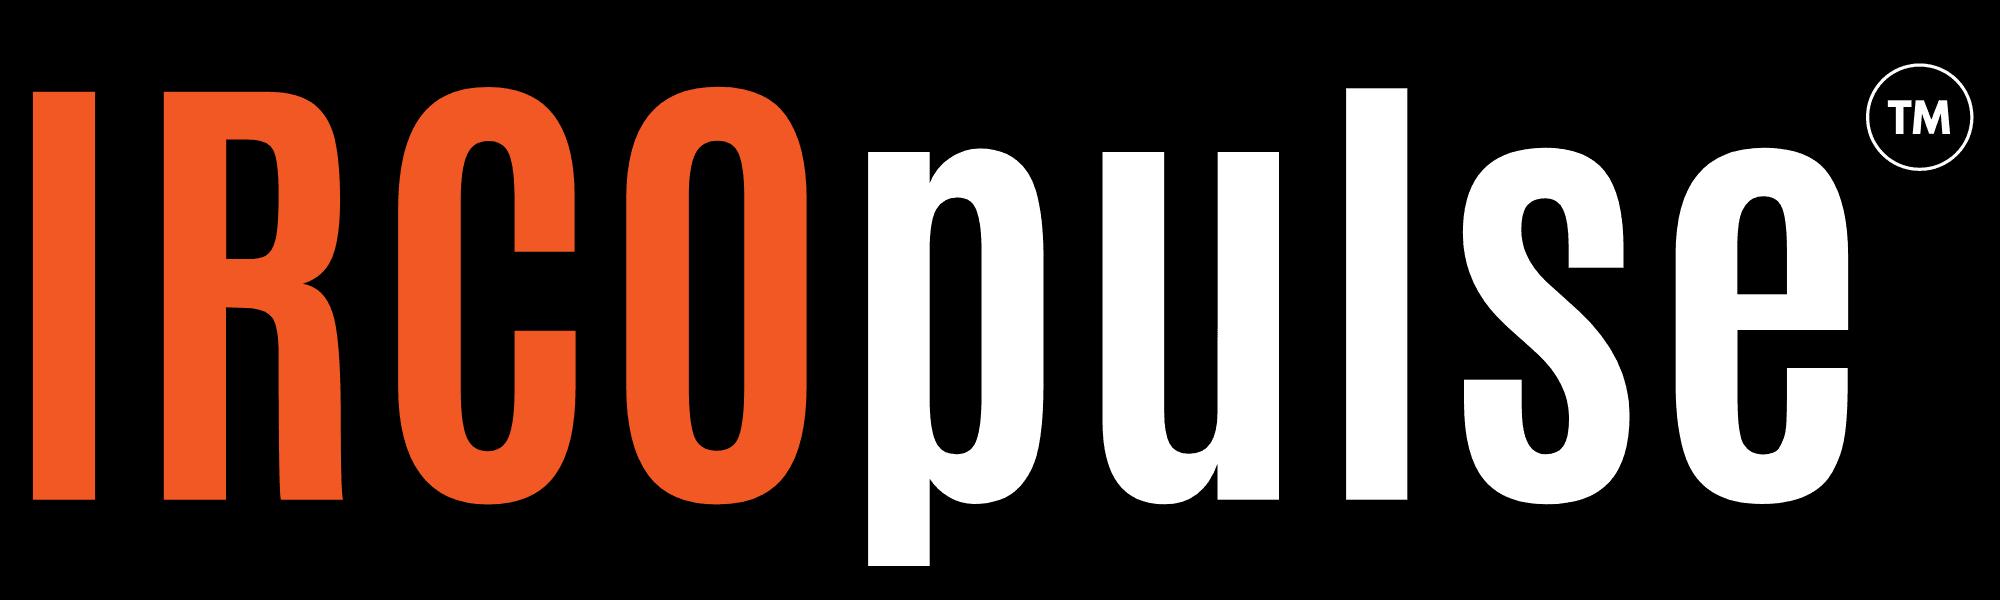 IRCOpulse logo